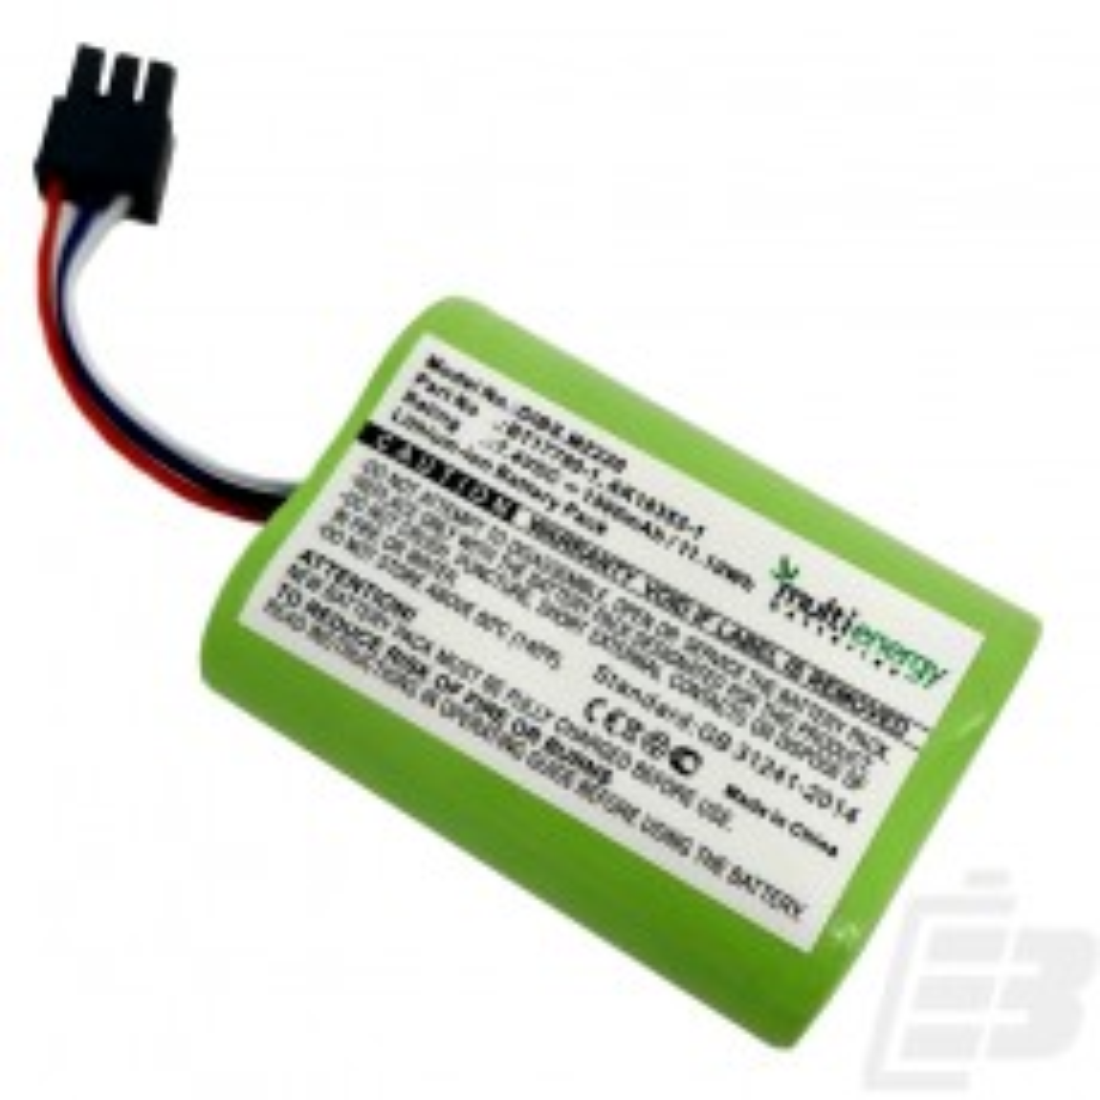 Barcode scanner battery Zebra MZ220_1